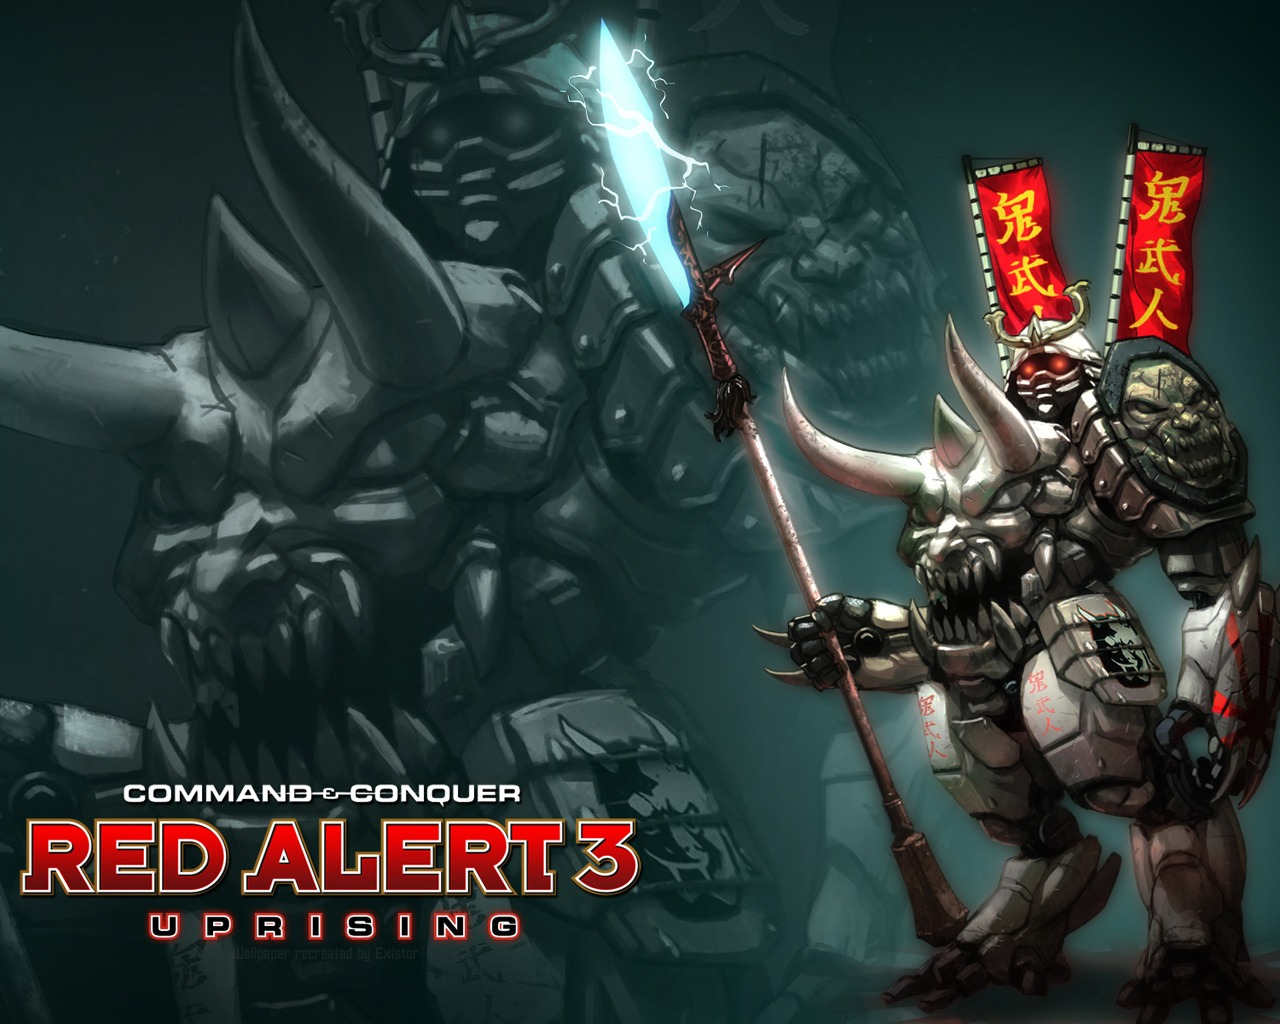 Red Alert 3 Uprising Wallpaper Red Alert 3 Games